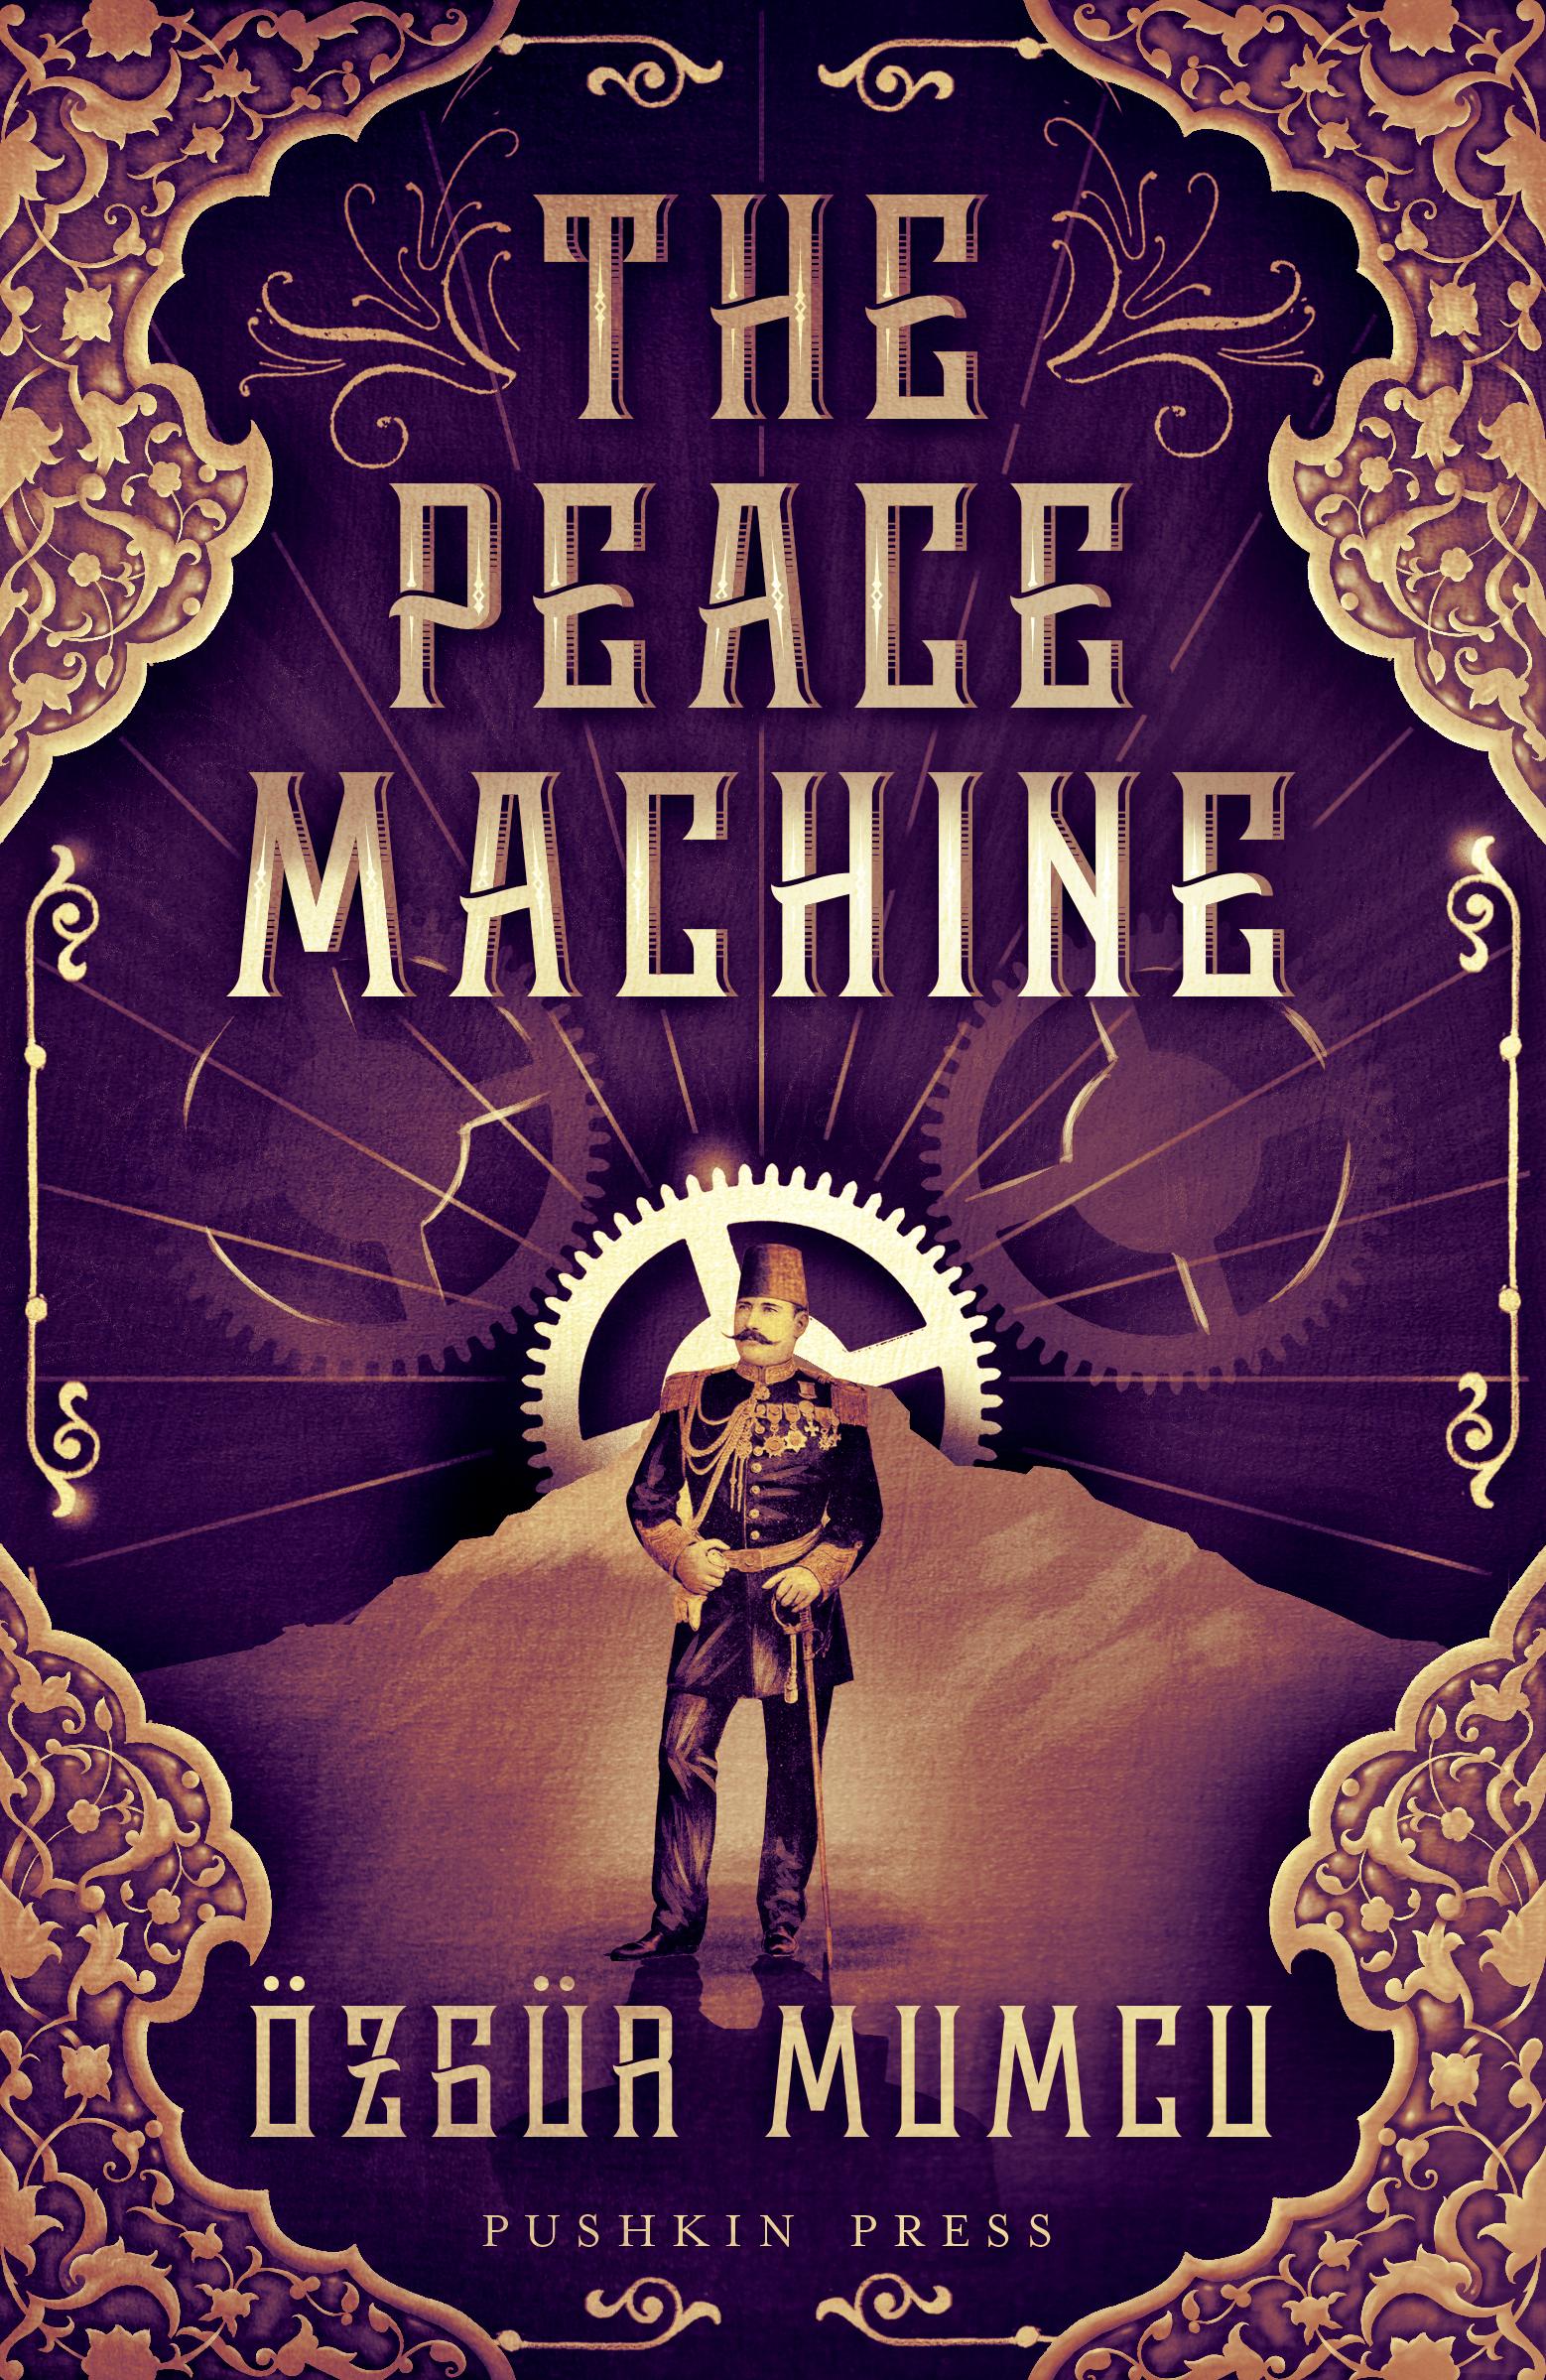 Peace+machine_draft-1.jpg